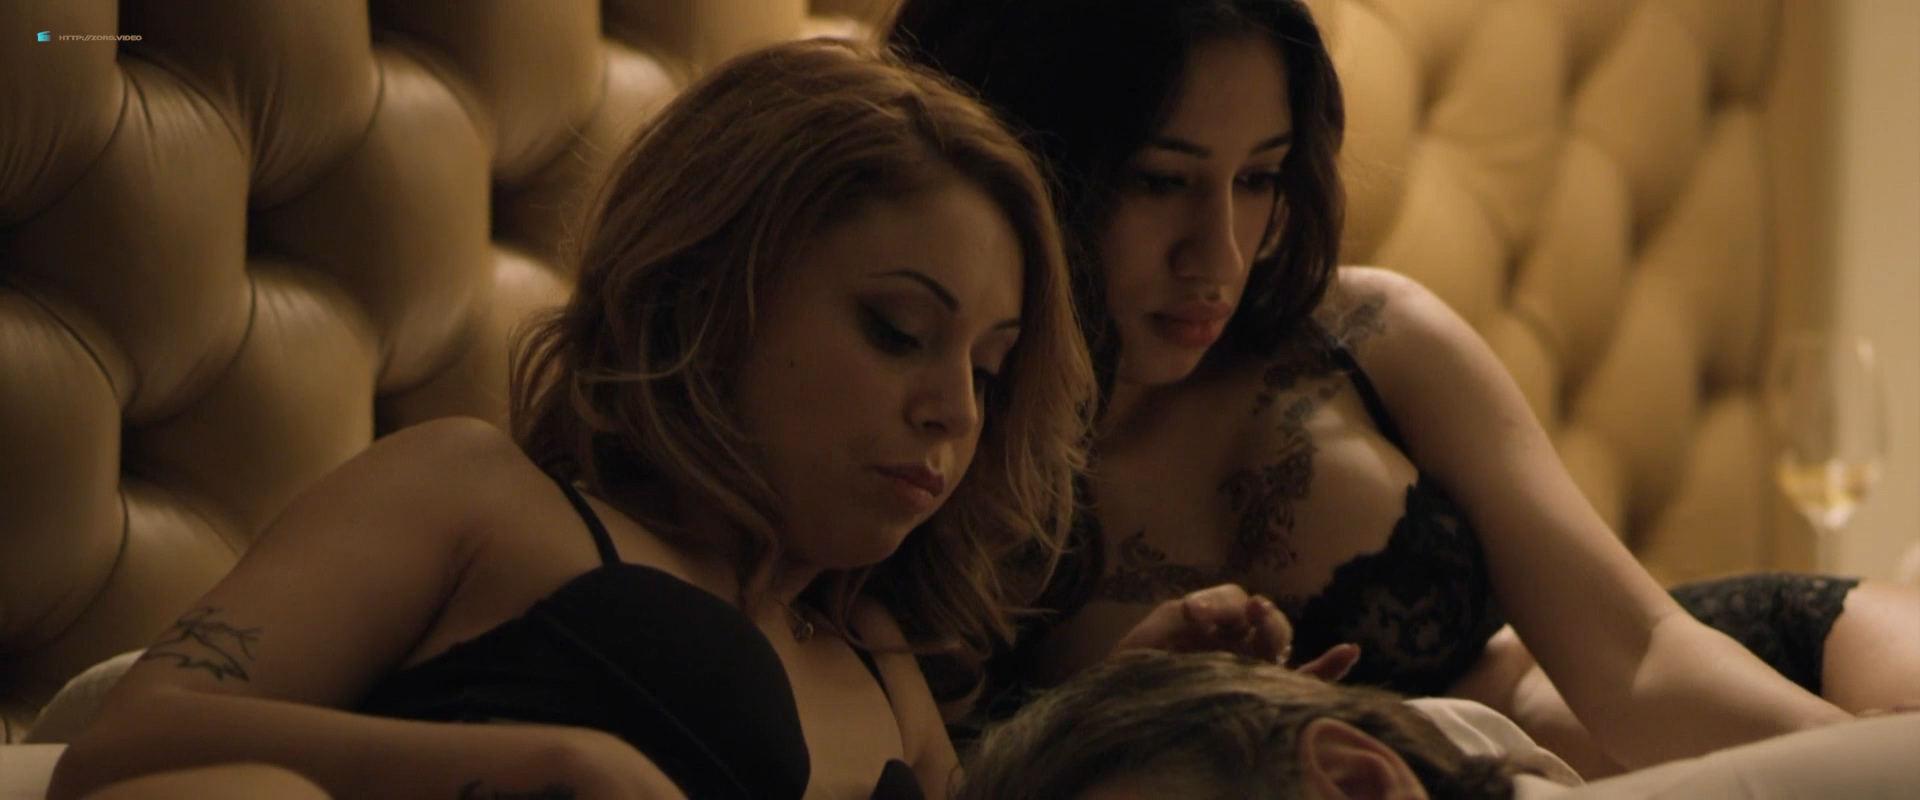 Simonetta Columbu nude topless Sara Deghdak and others hot - Io sono Tempesta (IT-2018) HD 1080p (10)